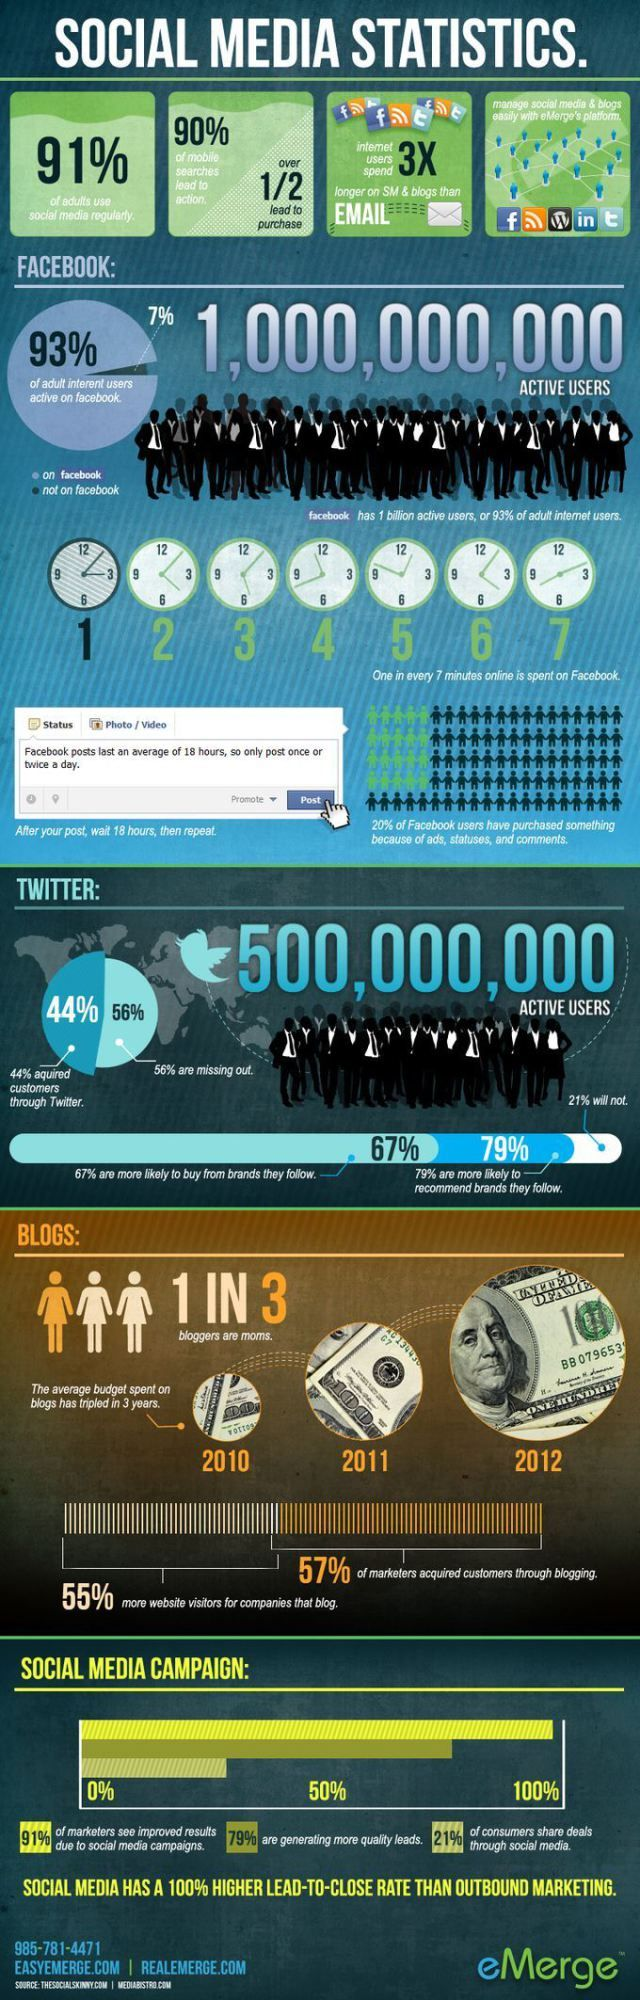 Social Media Statistics #infografia #infographic #socialmedia